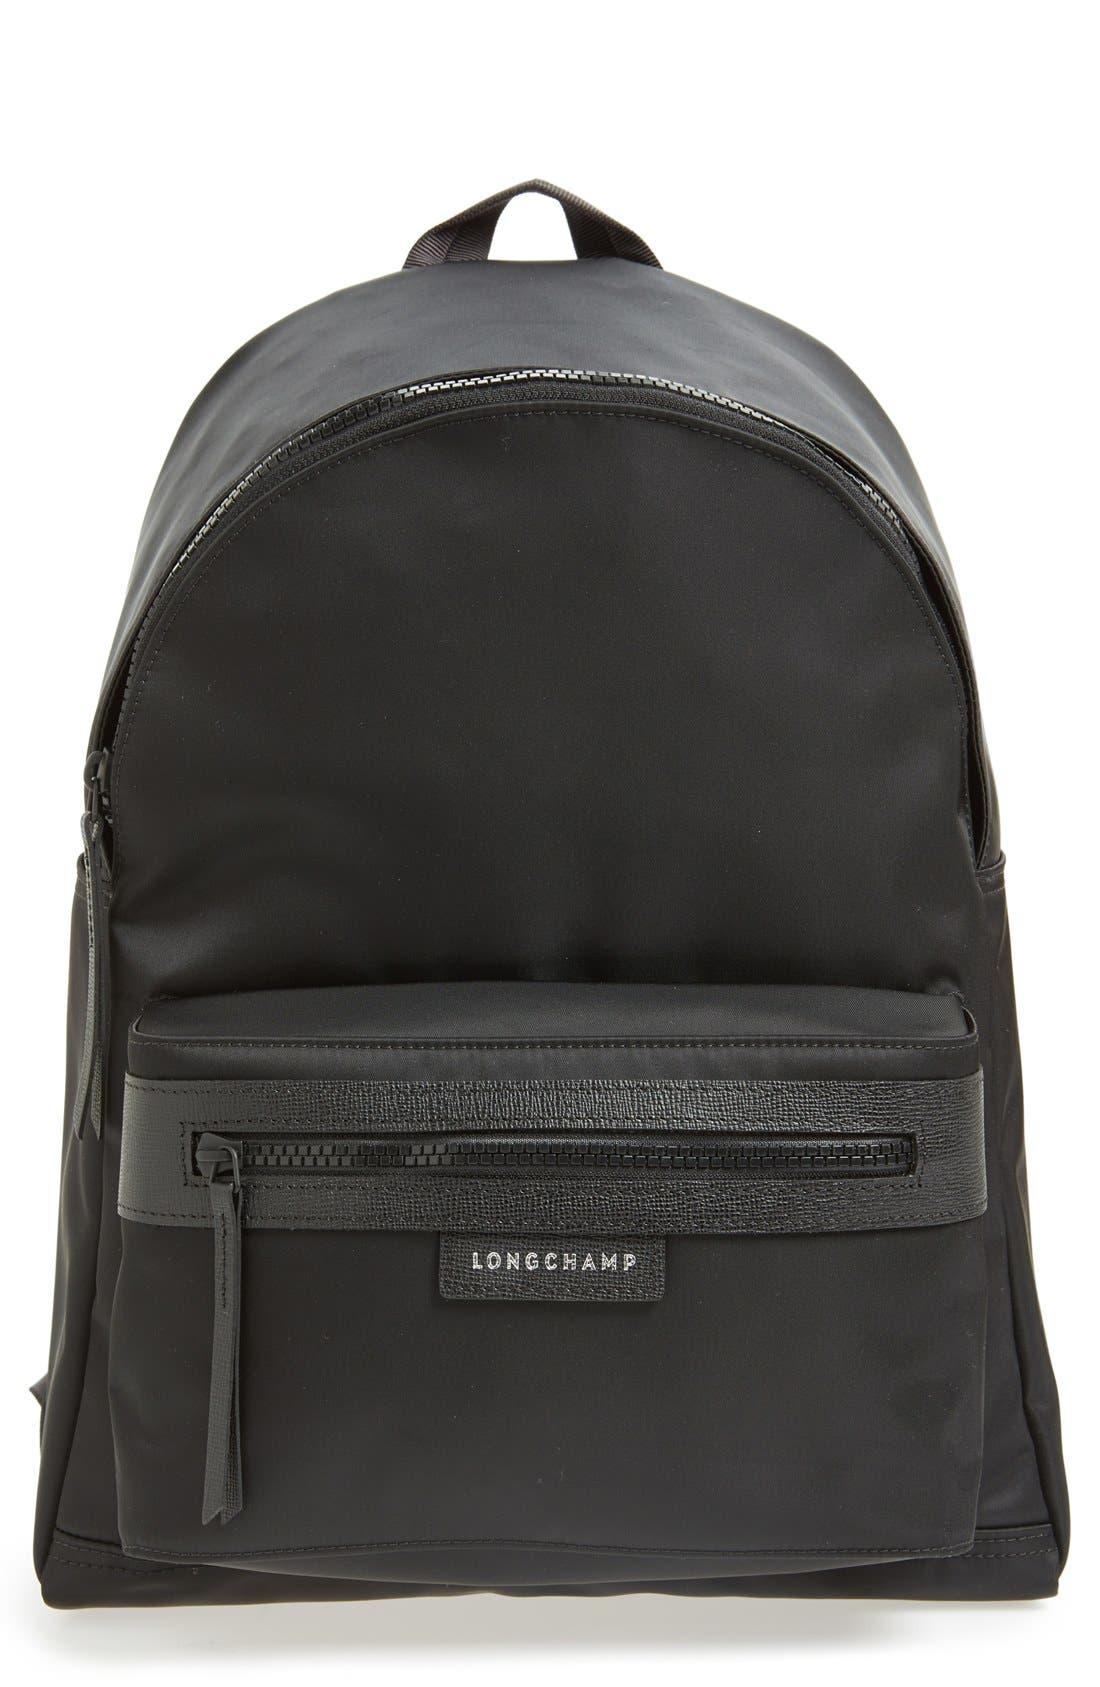 Main Image - Longchamp 'Le Pliage Neo' Nylon Backpack